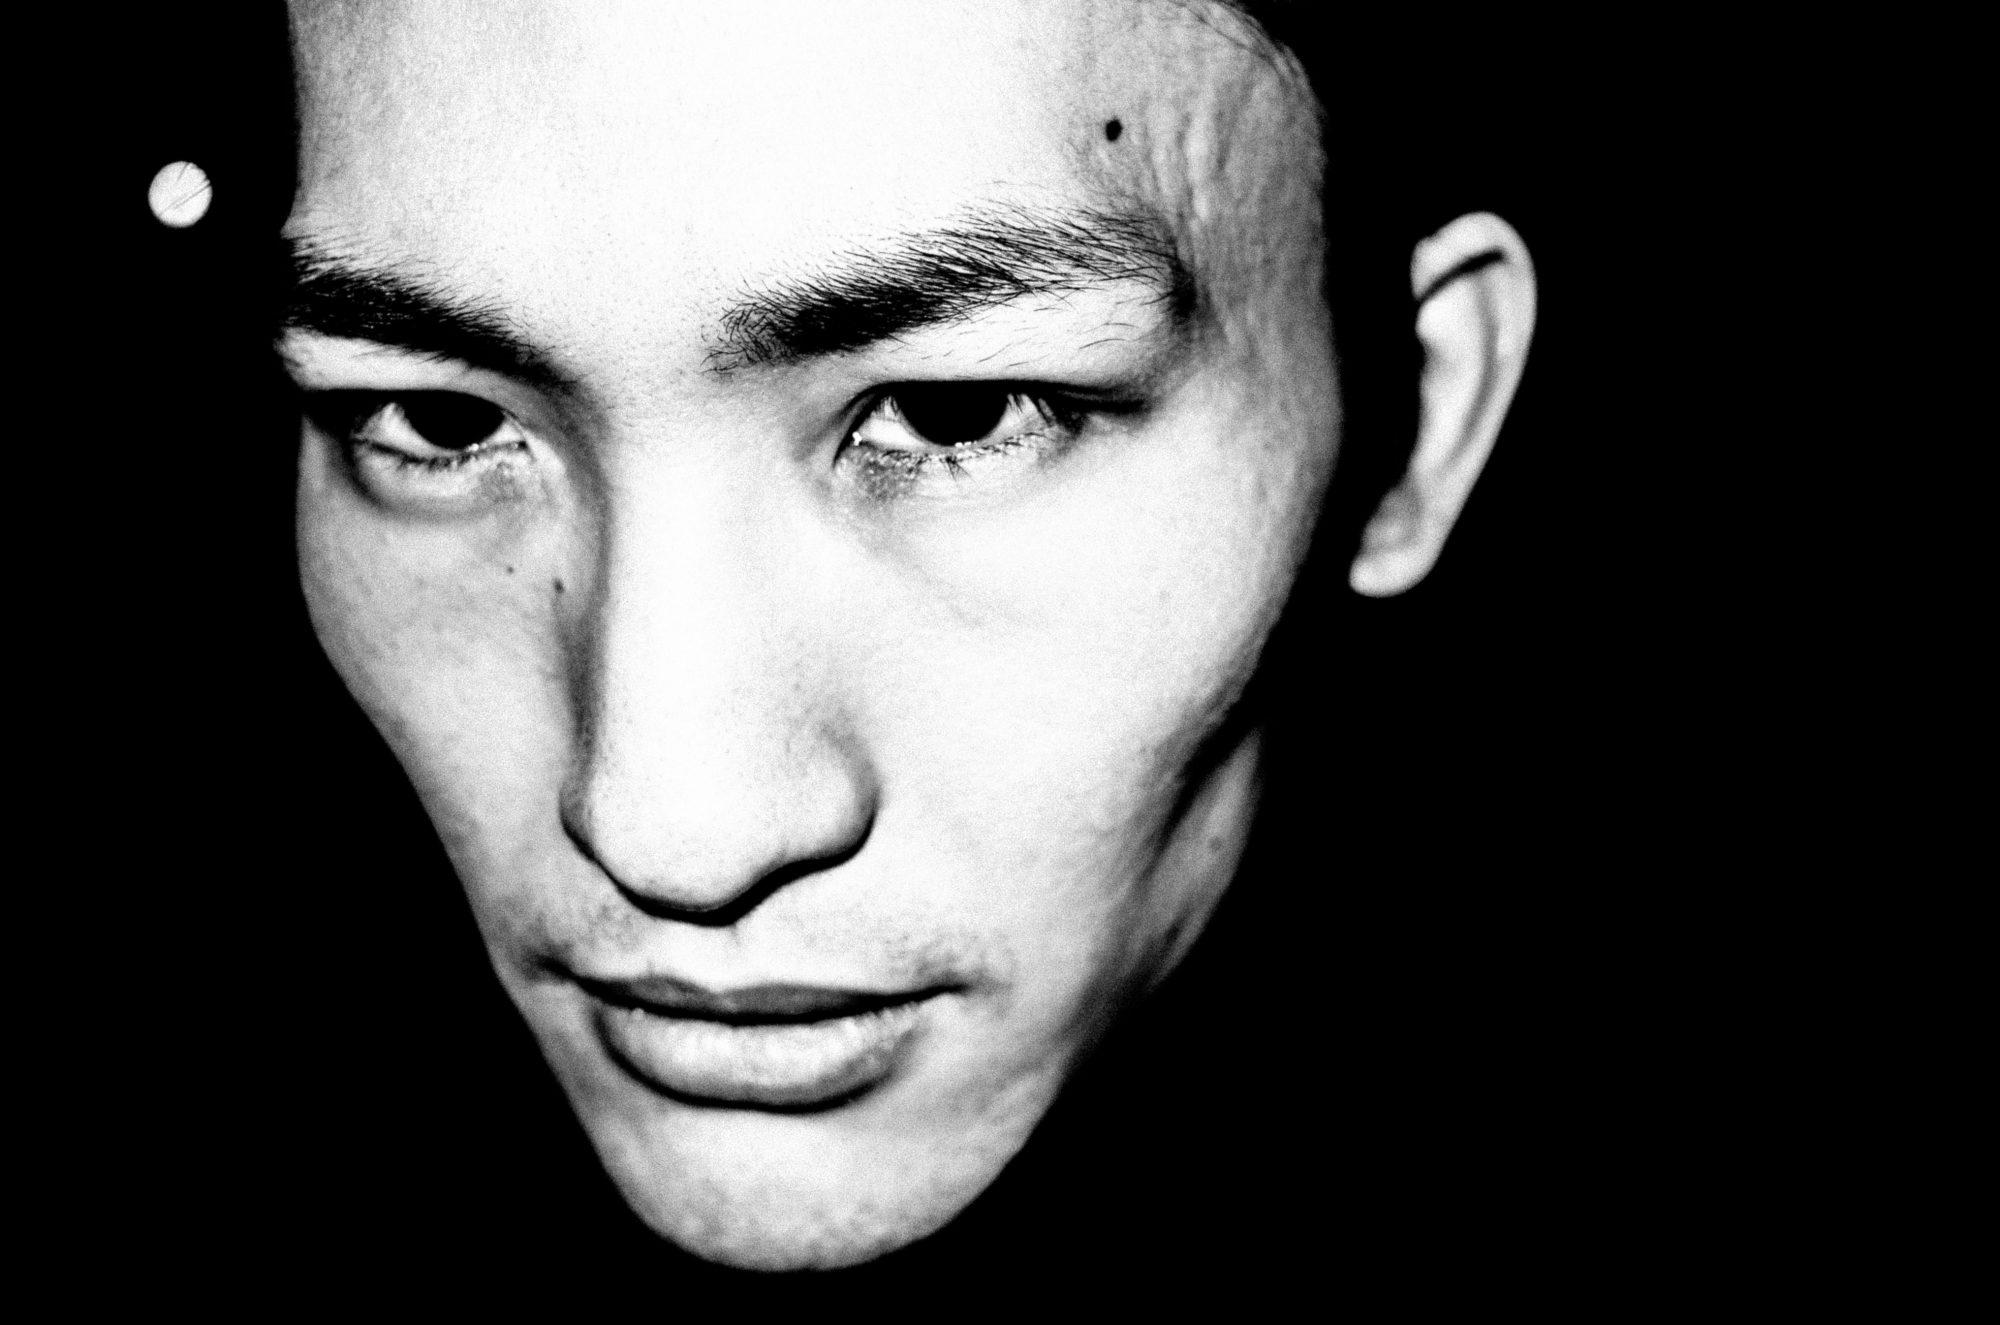 tokyo-eye-eric-kim-street-photography-contact-sheet-0000556